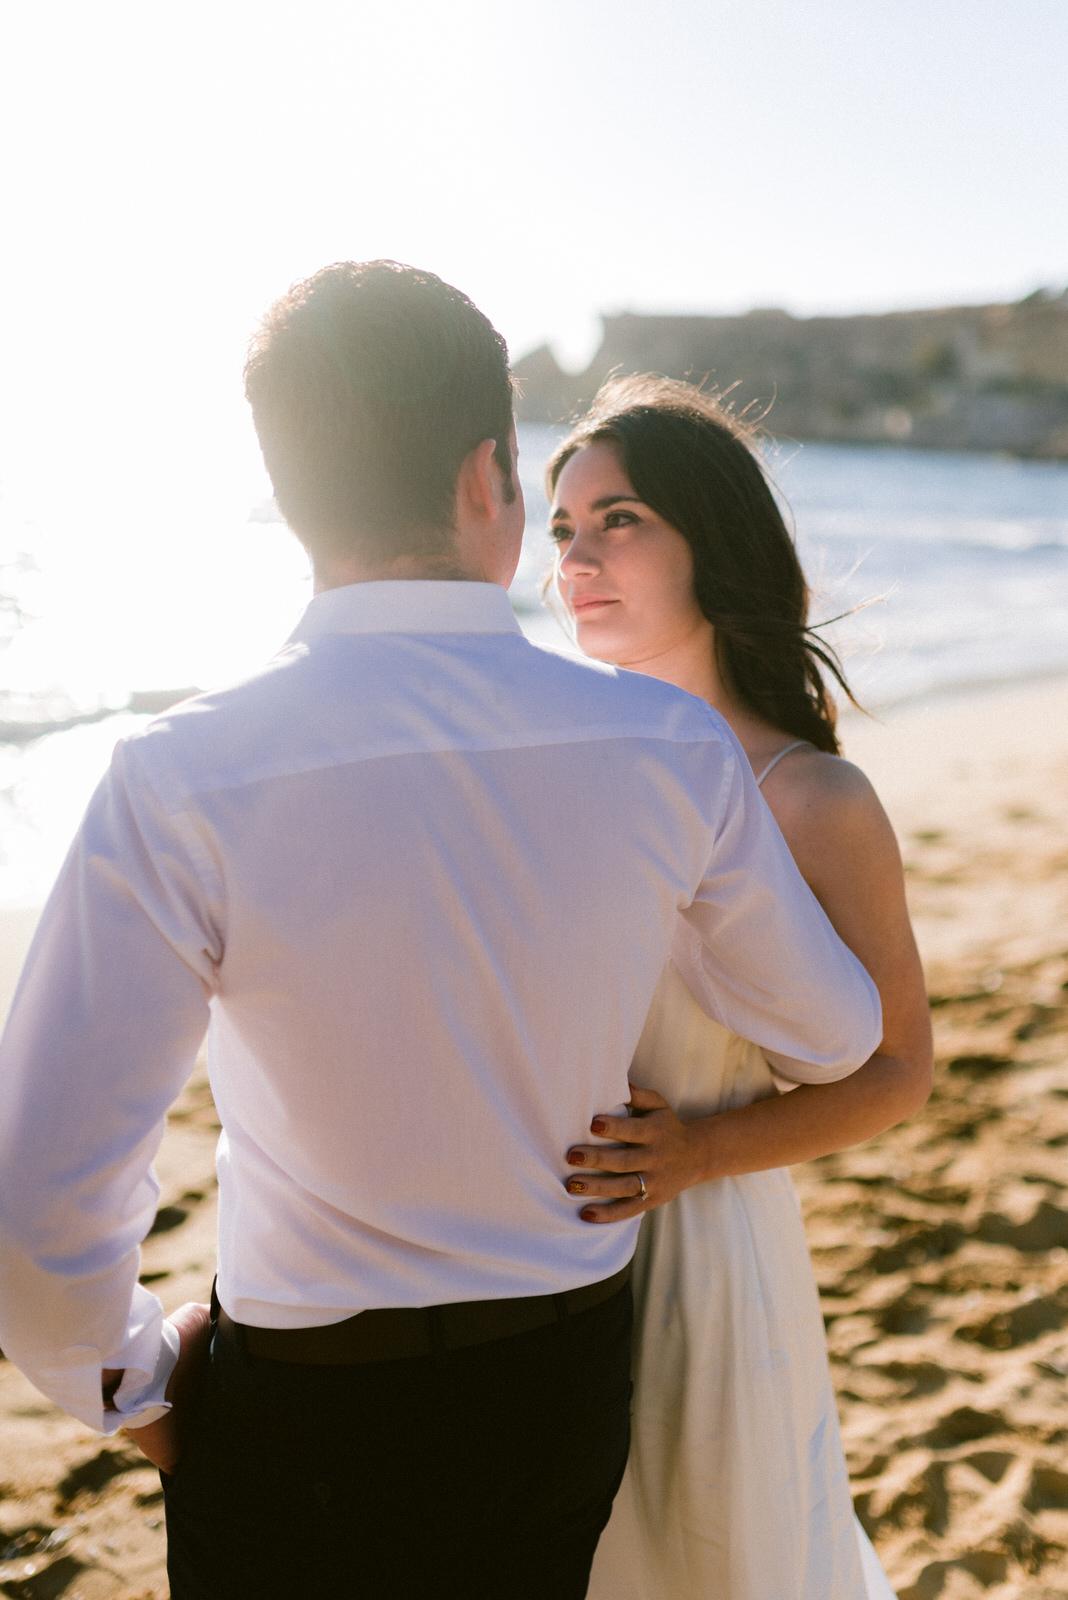 mdina wedding, malta wedding photography, malta elopement, golden bay malta wedding photos, wedding photographer malta, malta wedding venue, villa bologna wedding (63).jpg